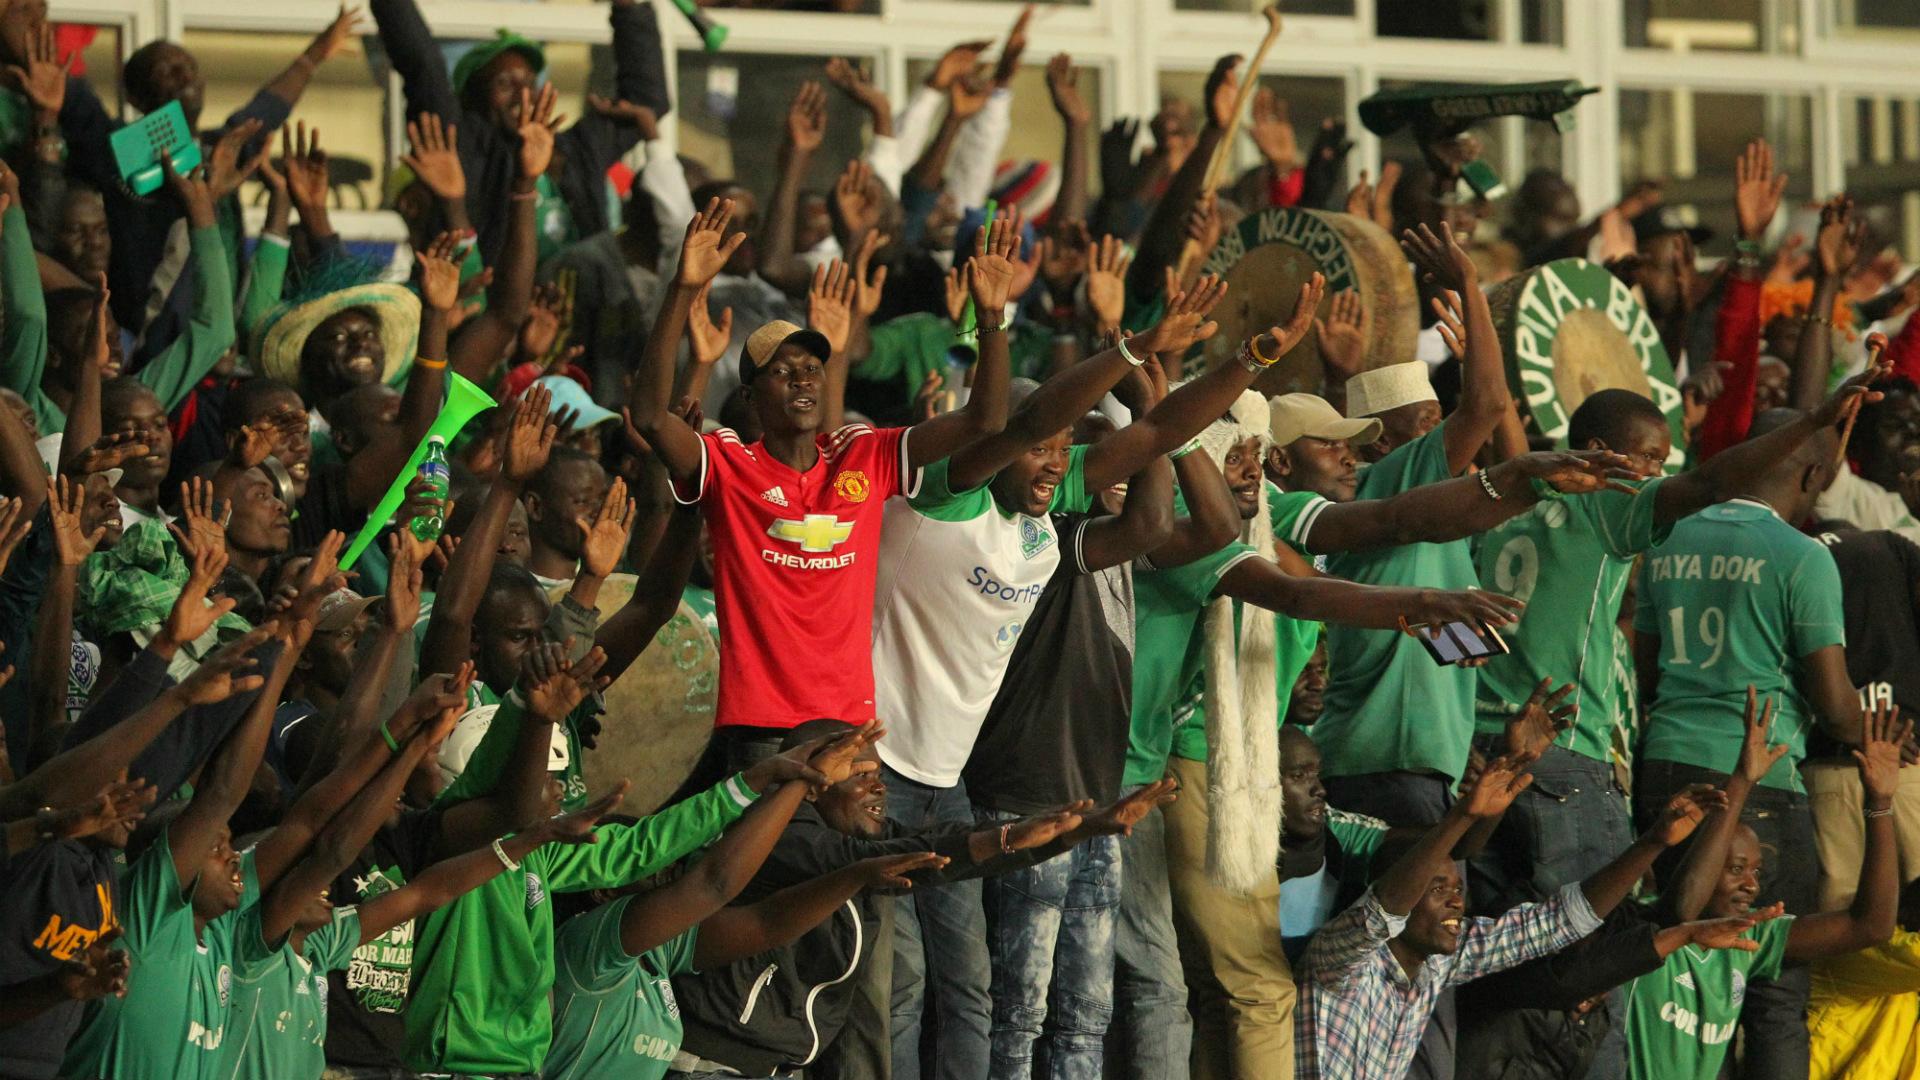 Gor Mahia fans at Kasarani Stadiu v Yanga of Tanzania.